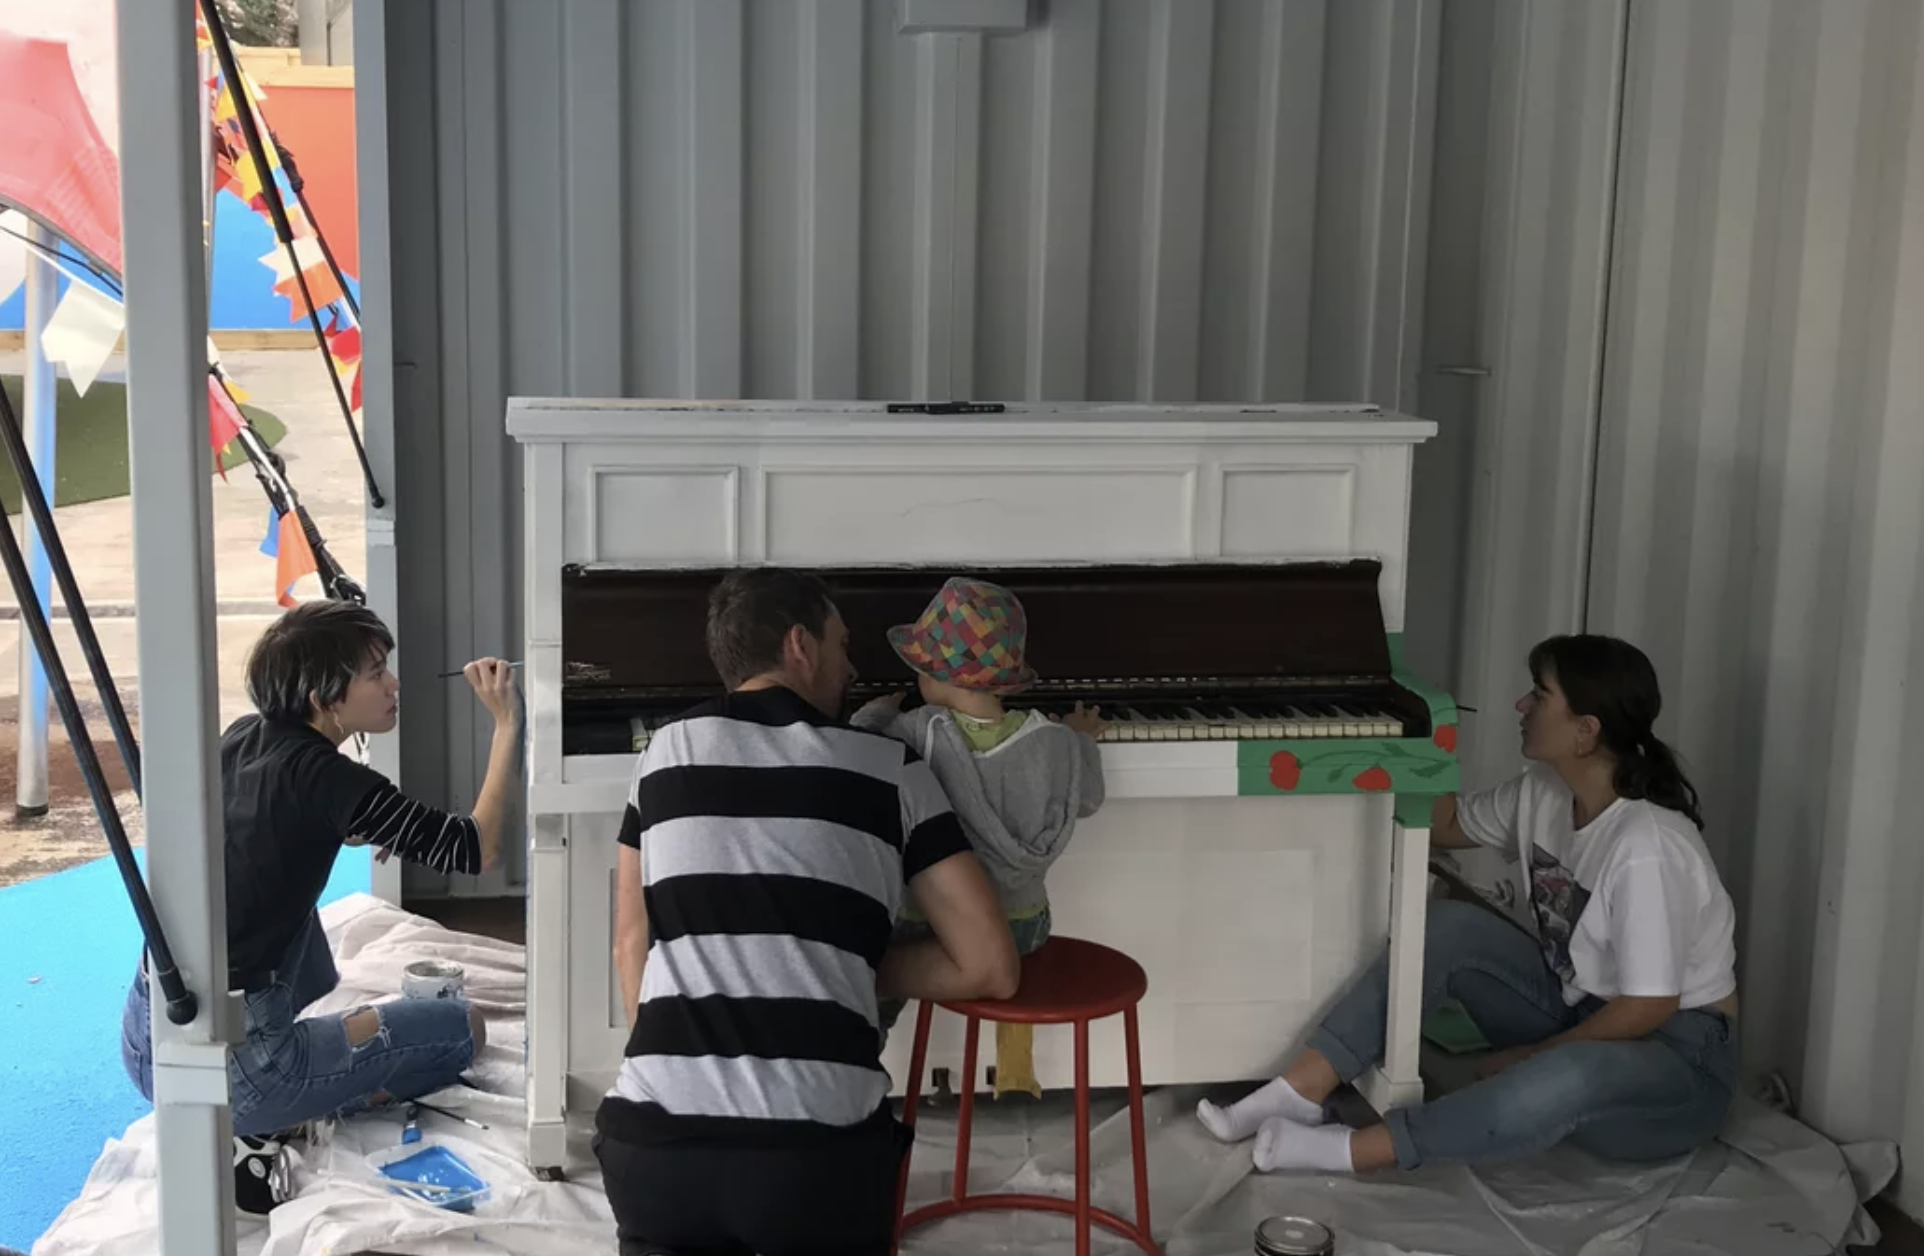 Public piano turns heads in Takapuna